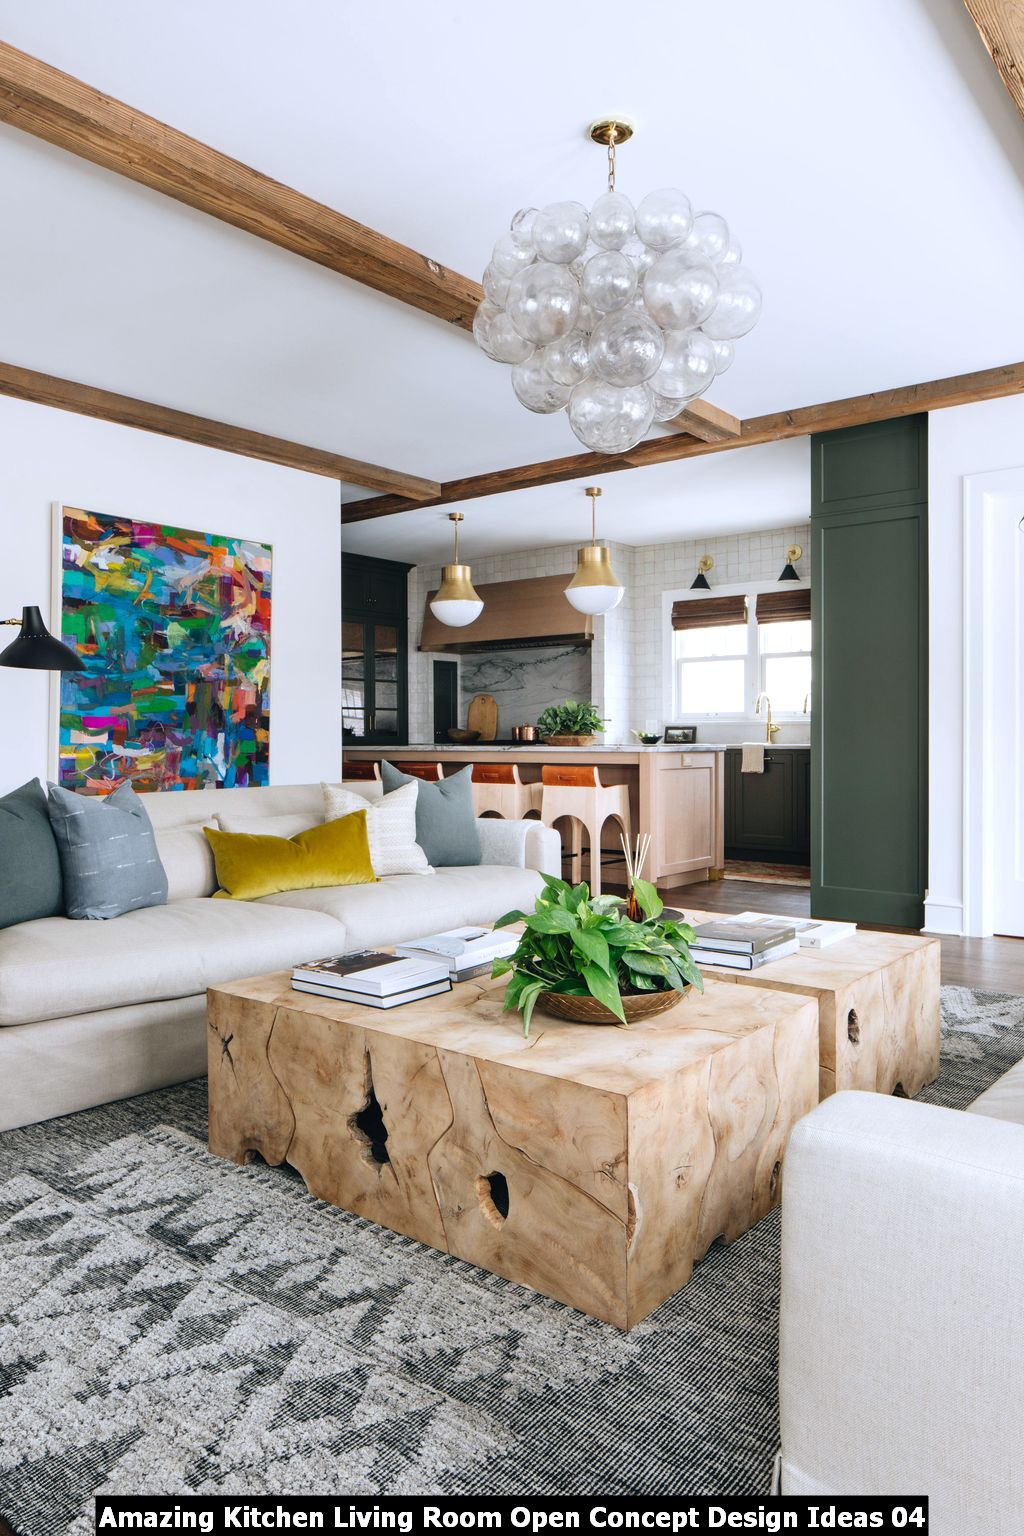 Amazing Kitchen Living Room Open Concept Design Ideas 04